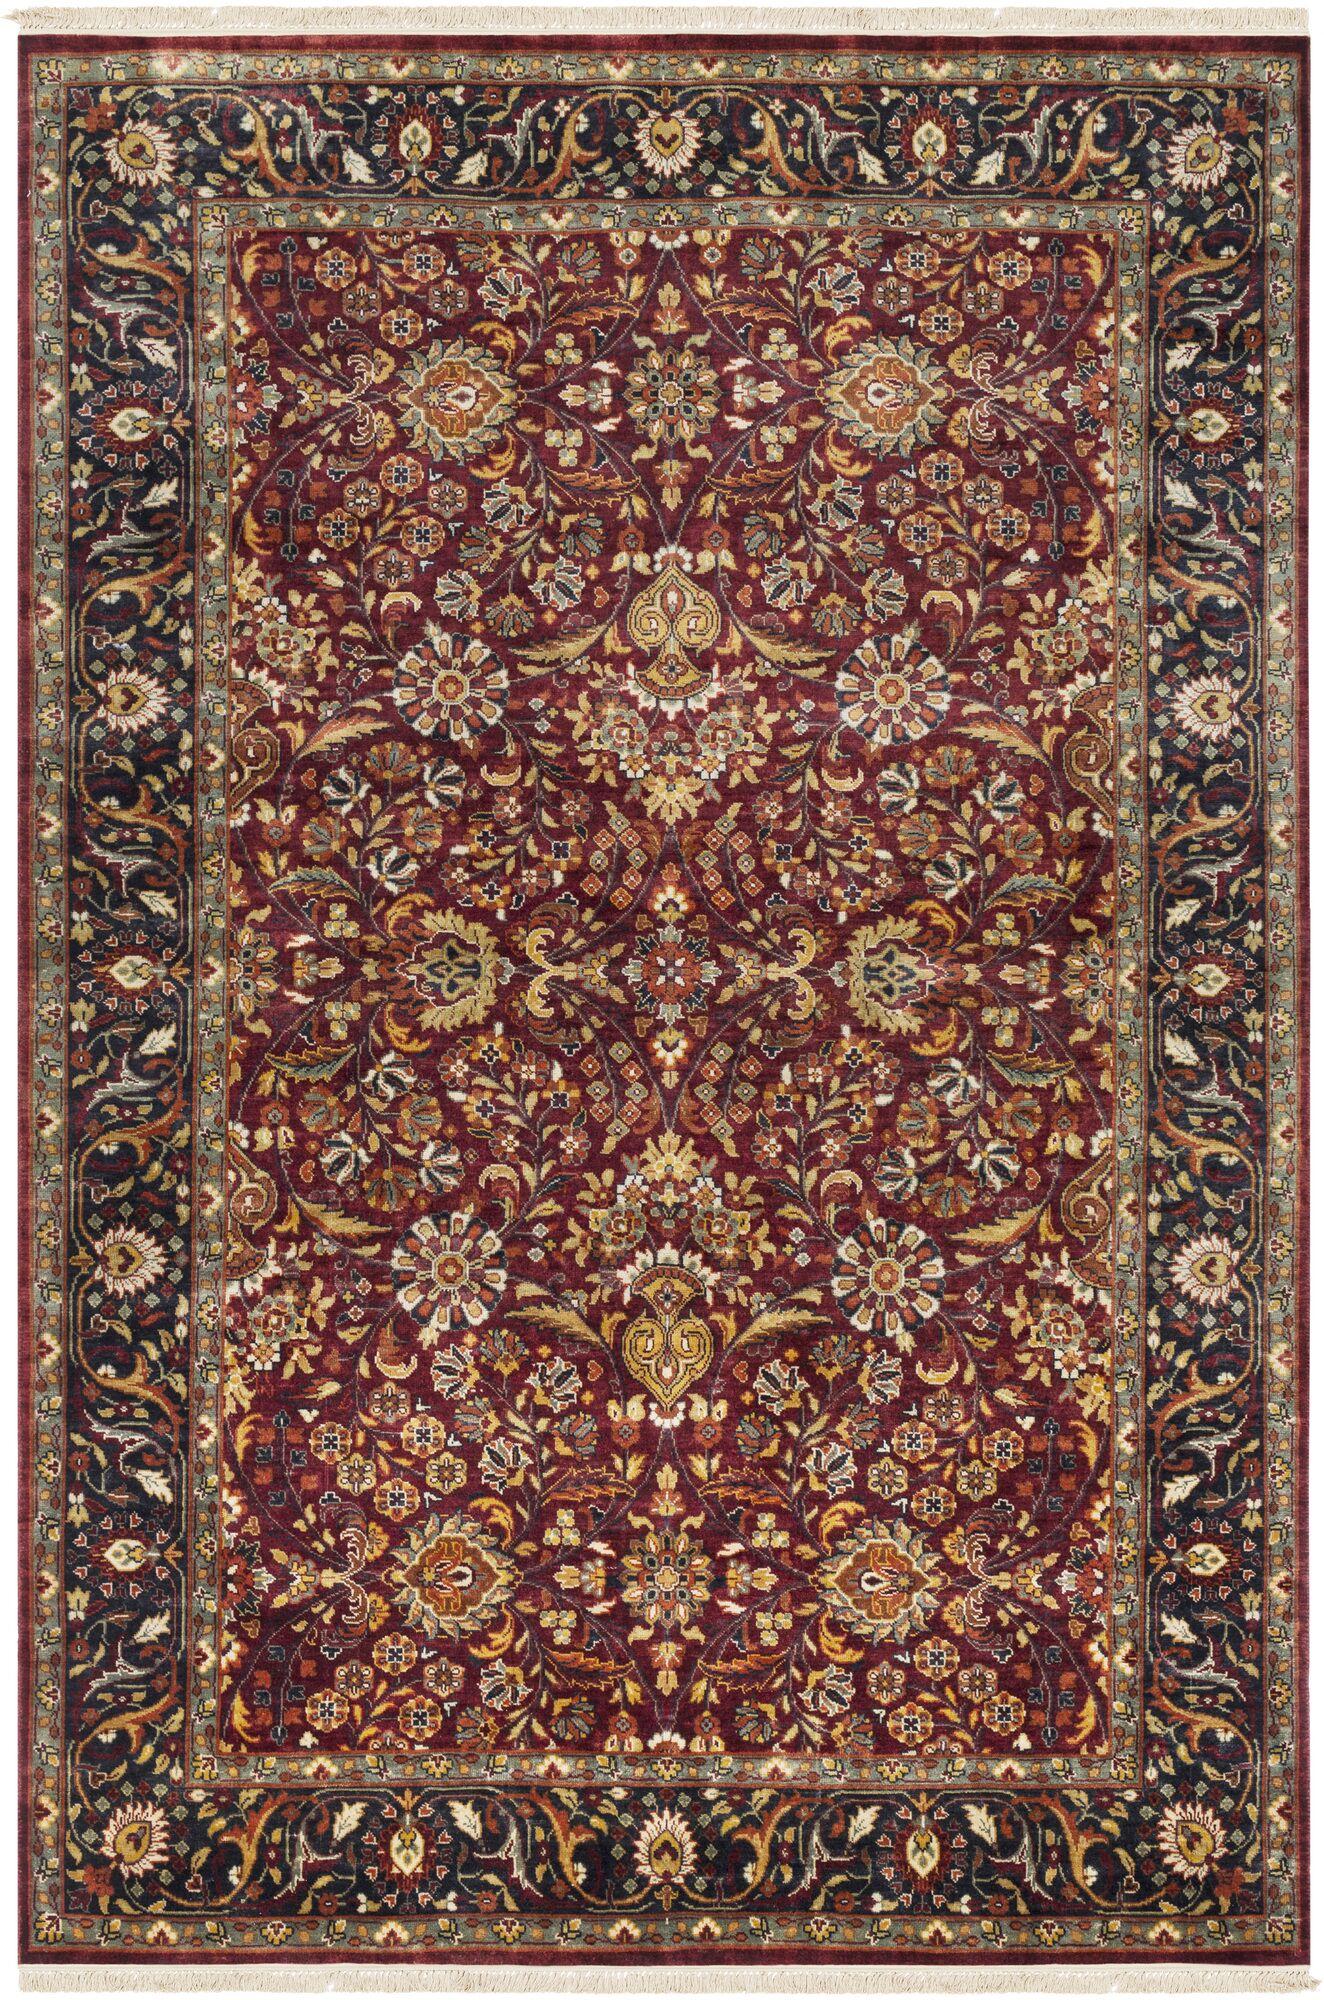 Fernwood Oriental Hand Knotted Wool Garnet/Dark Brown Area Rug Rug Size: 5'6